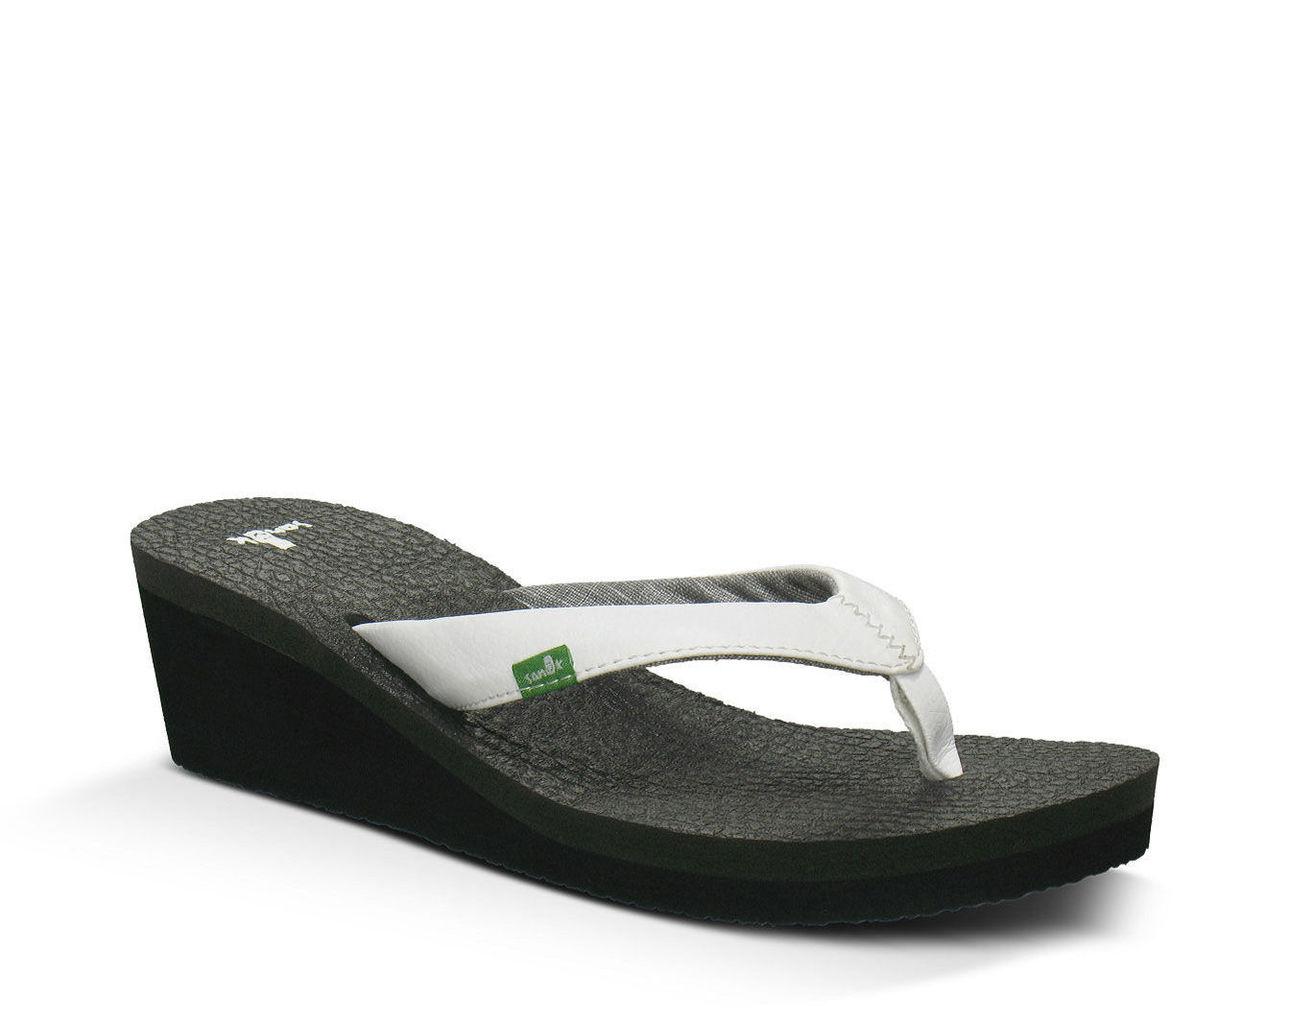 Sanuk Yoga Mat Wedge Sandals Yoga Direct